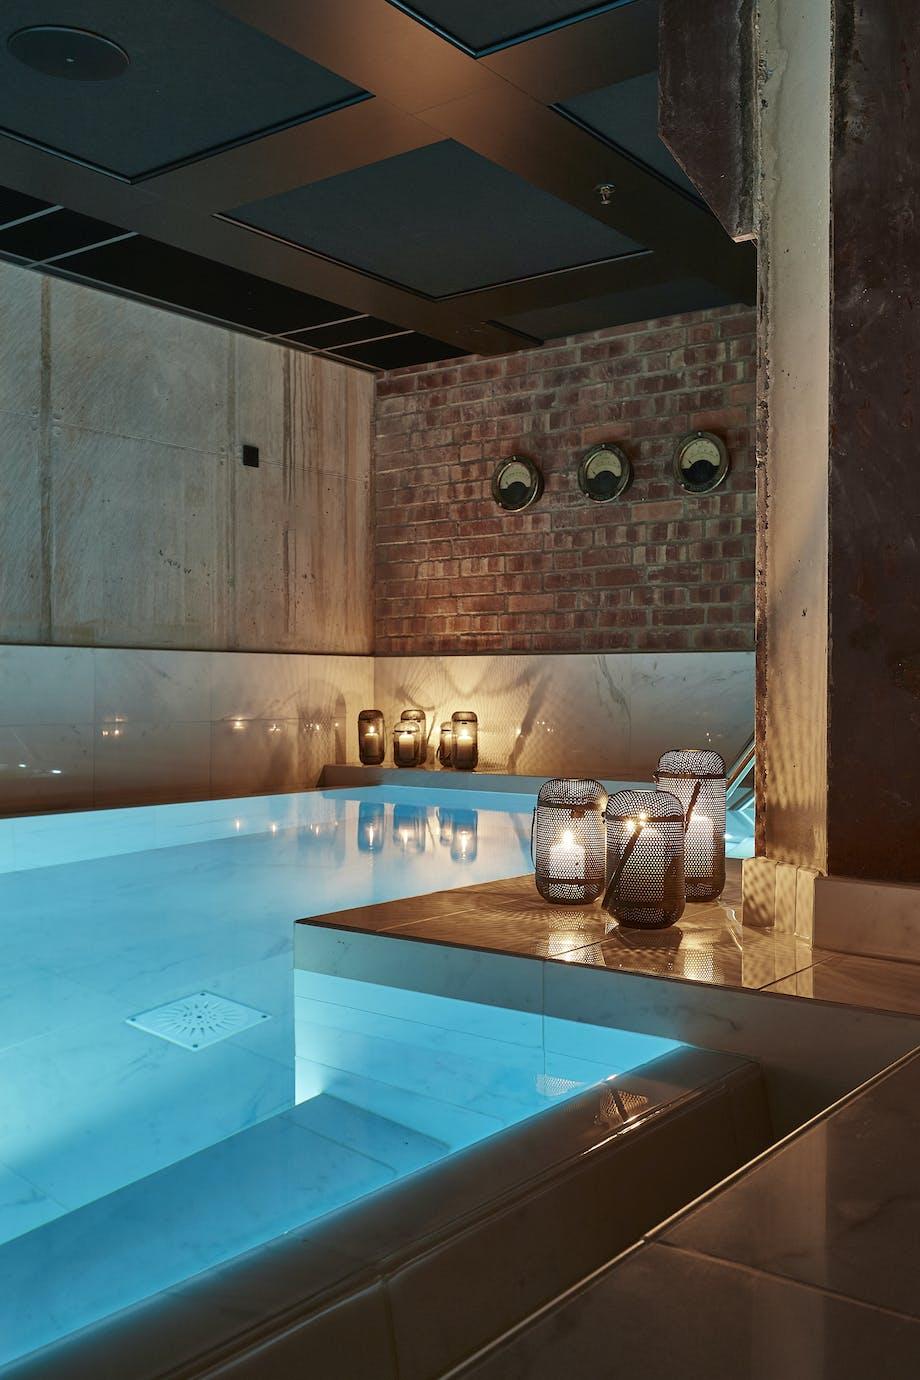 Spa lys pool luksus